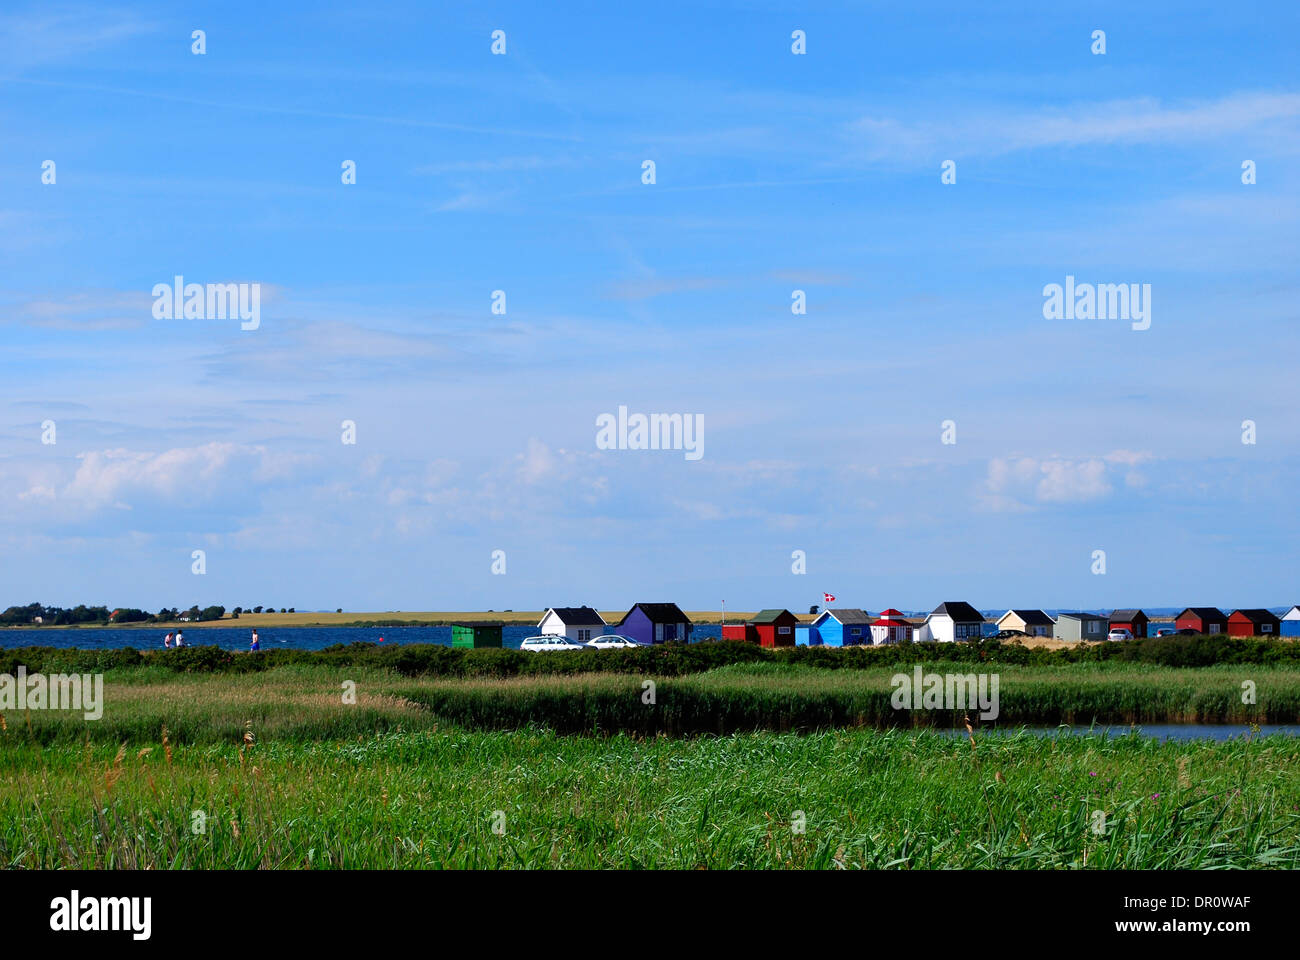 Aero island, beach Huts at Aeroskobing Vesterstrand, fyn, Denmark, Scandinavia, Europe - Stock Image